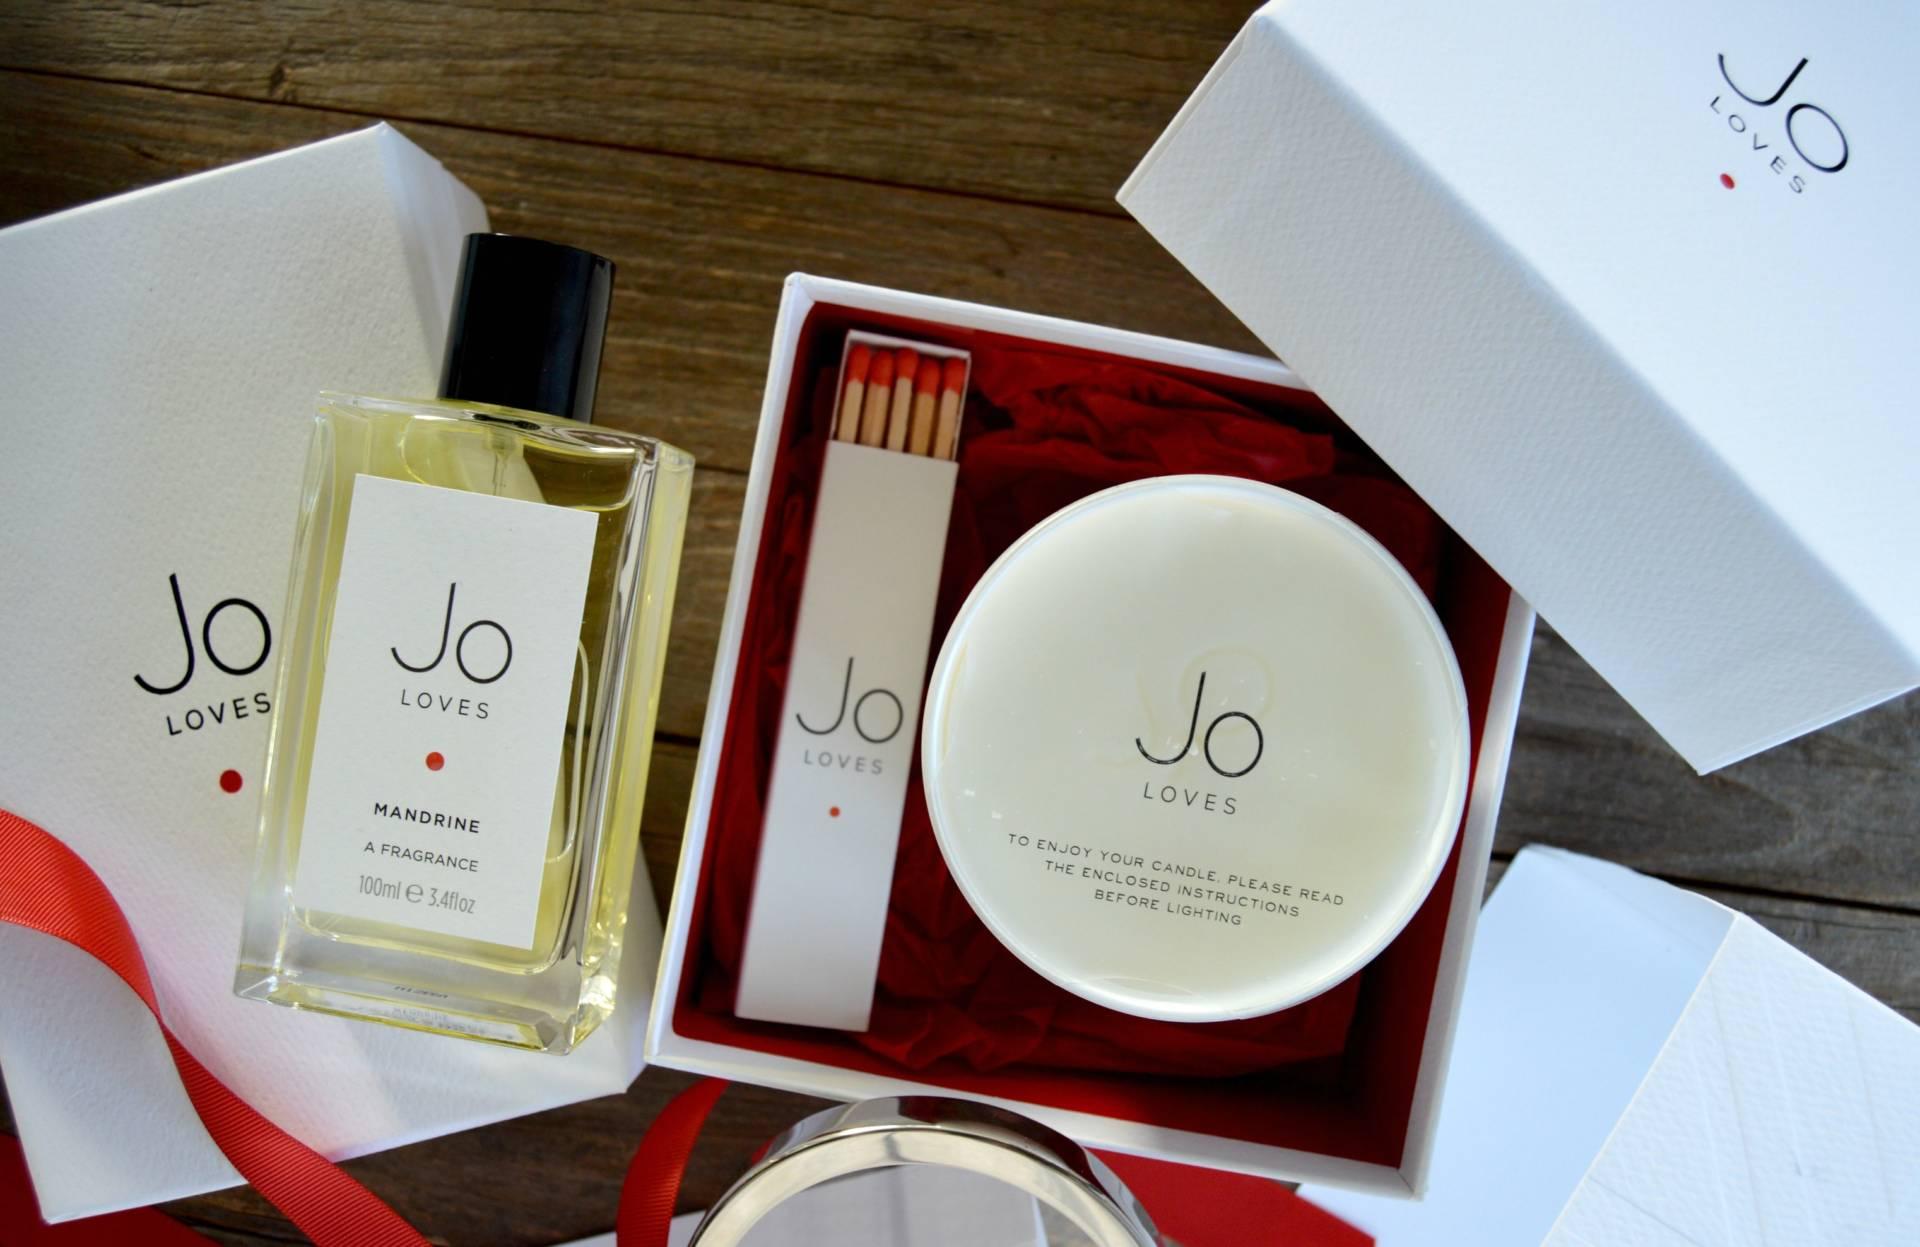 jo loves mandrine candle studio review inhautepursuit